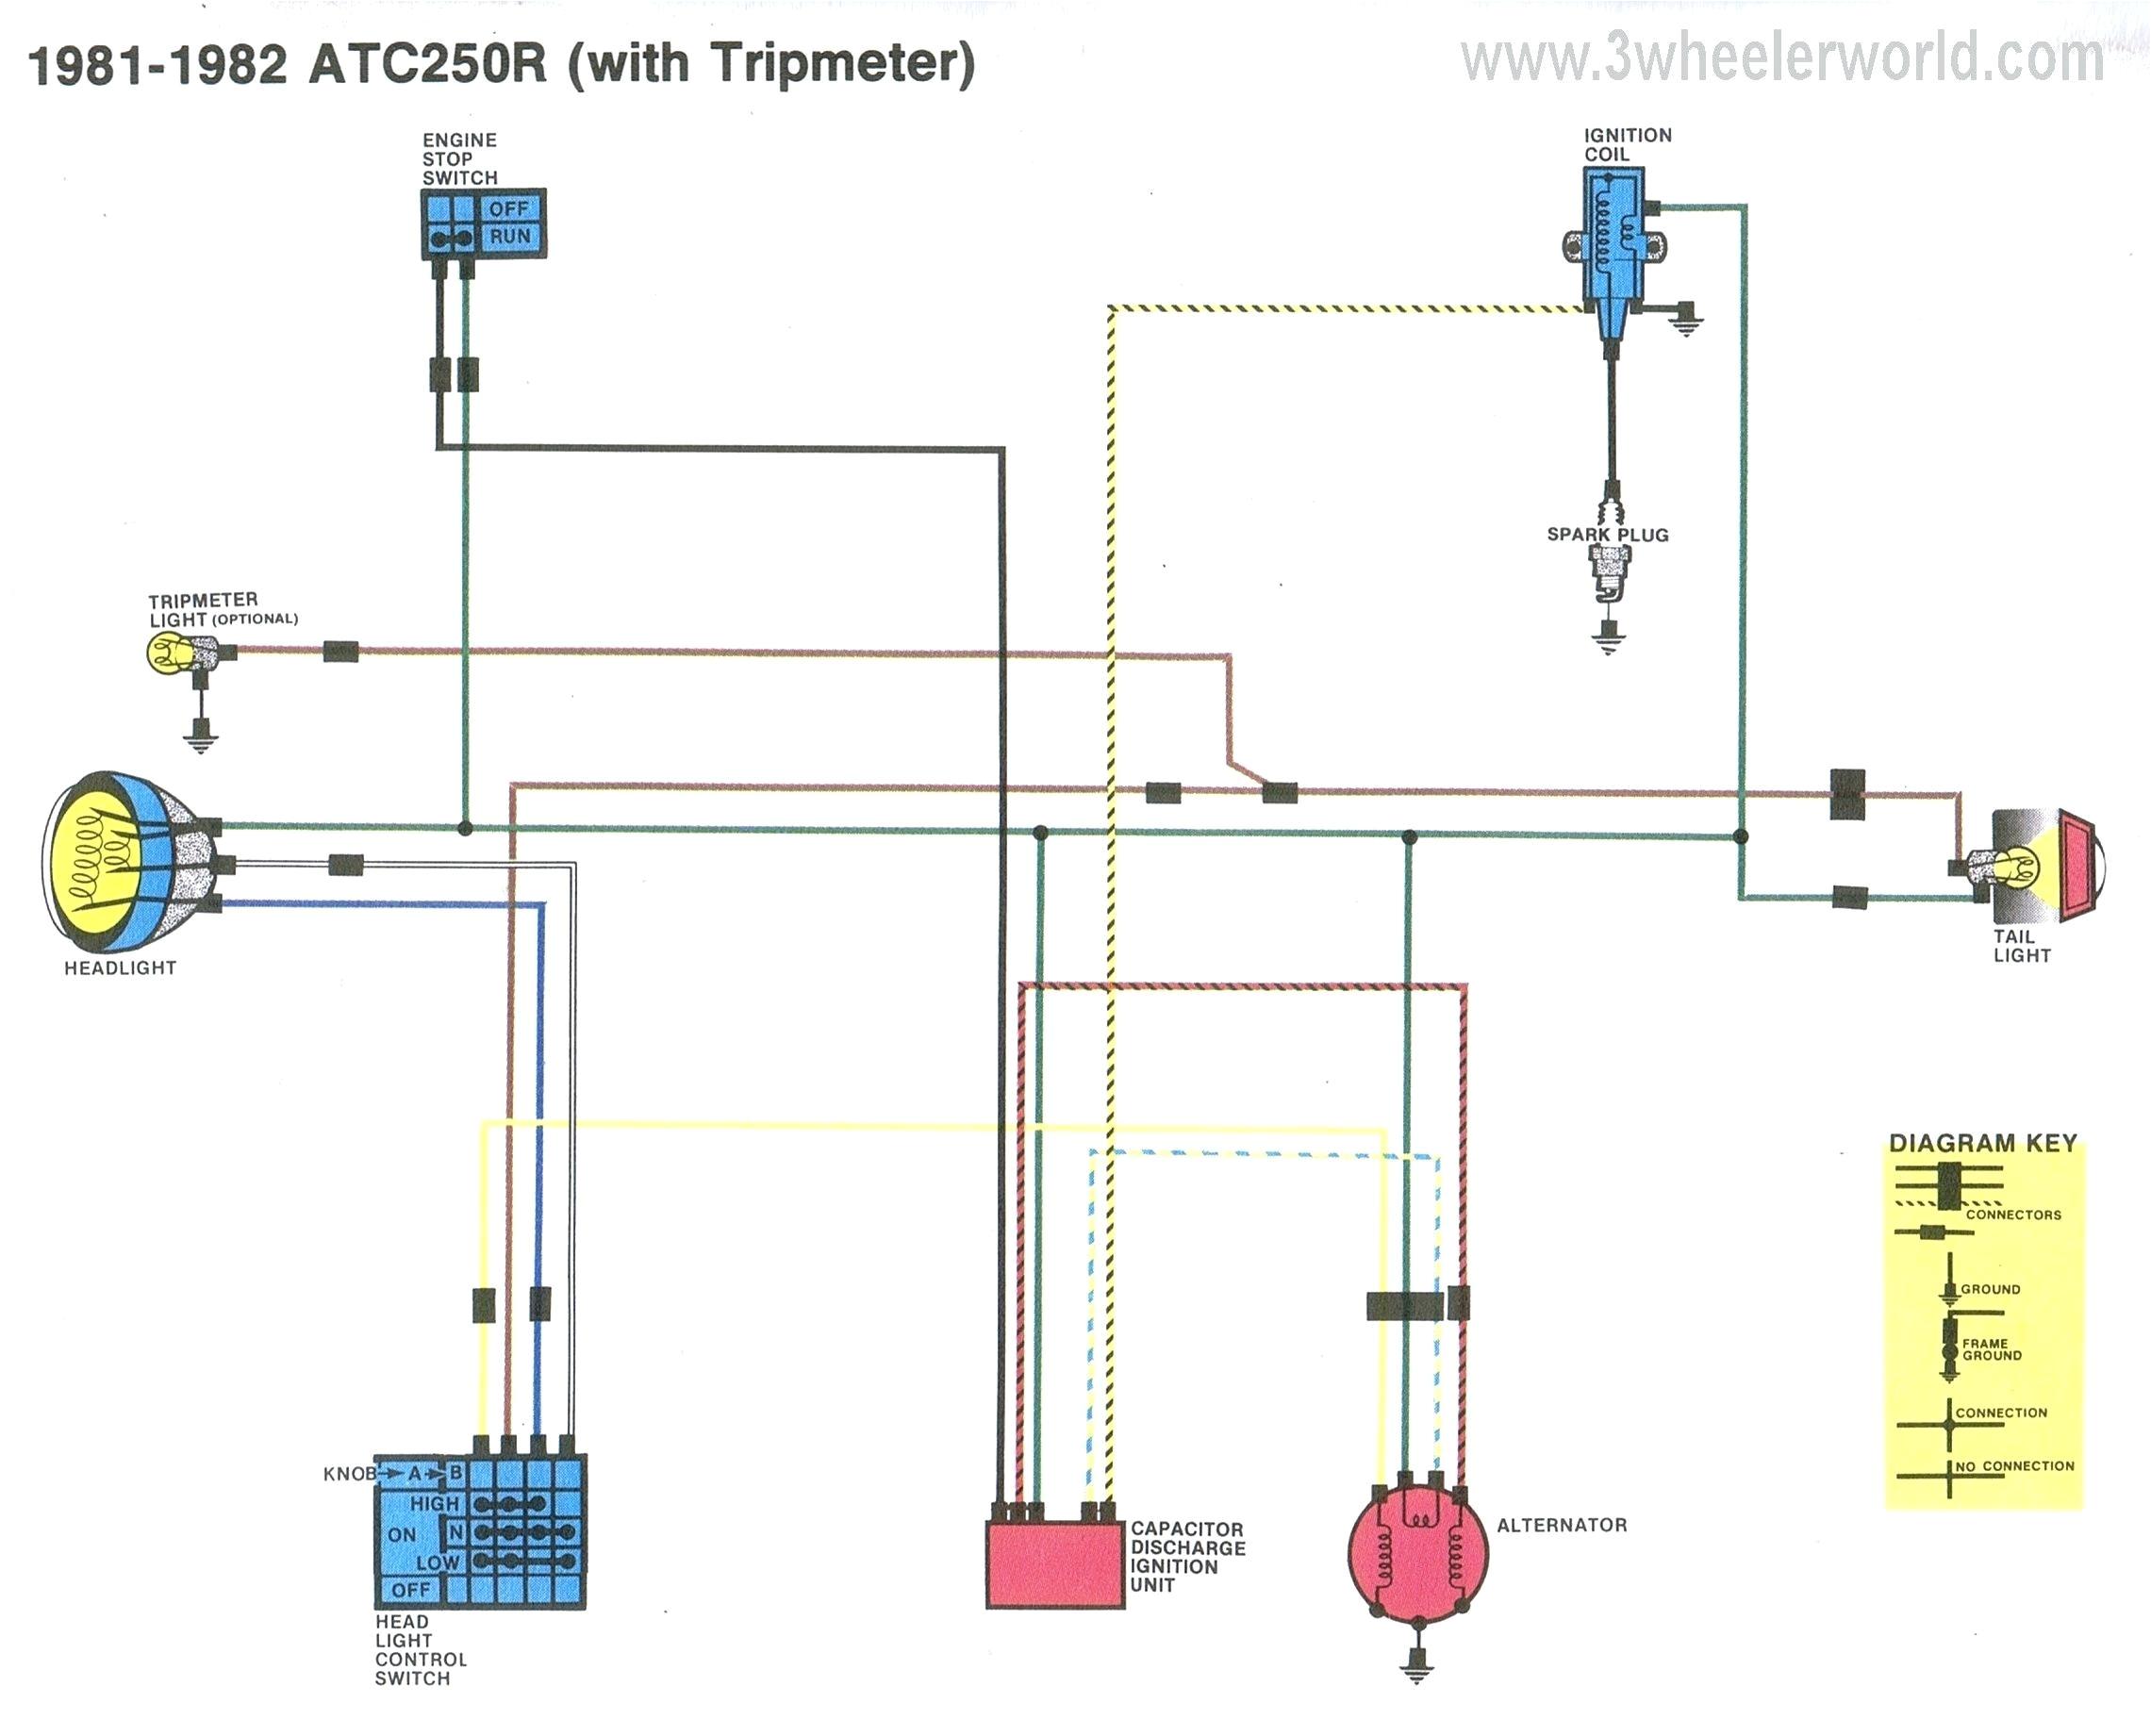 honda 125 motorcycle engine diagram wiring diagrams konsult honda pcx 125 wiring diagram honda 125 motorcycle